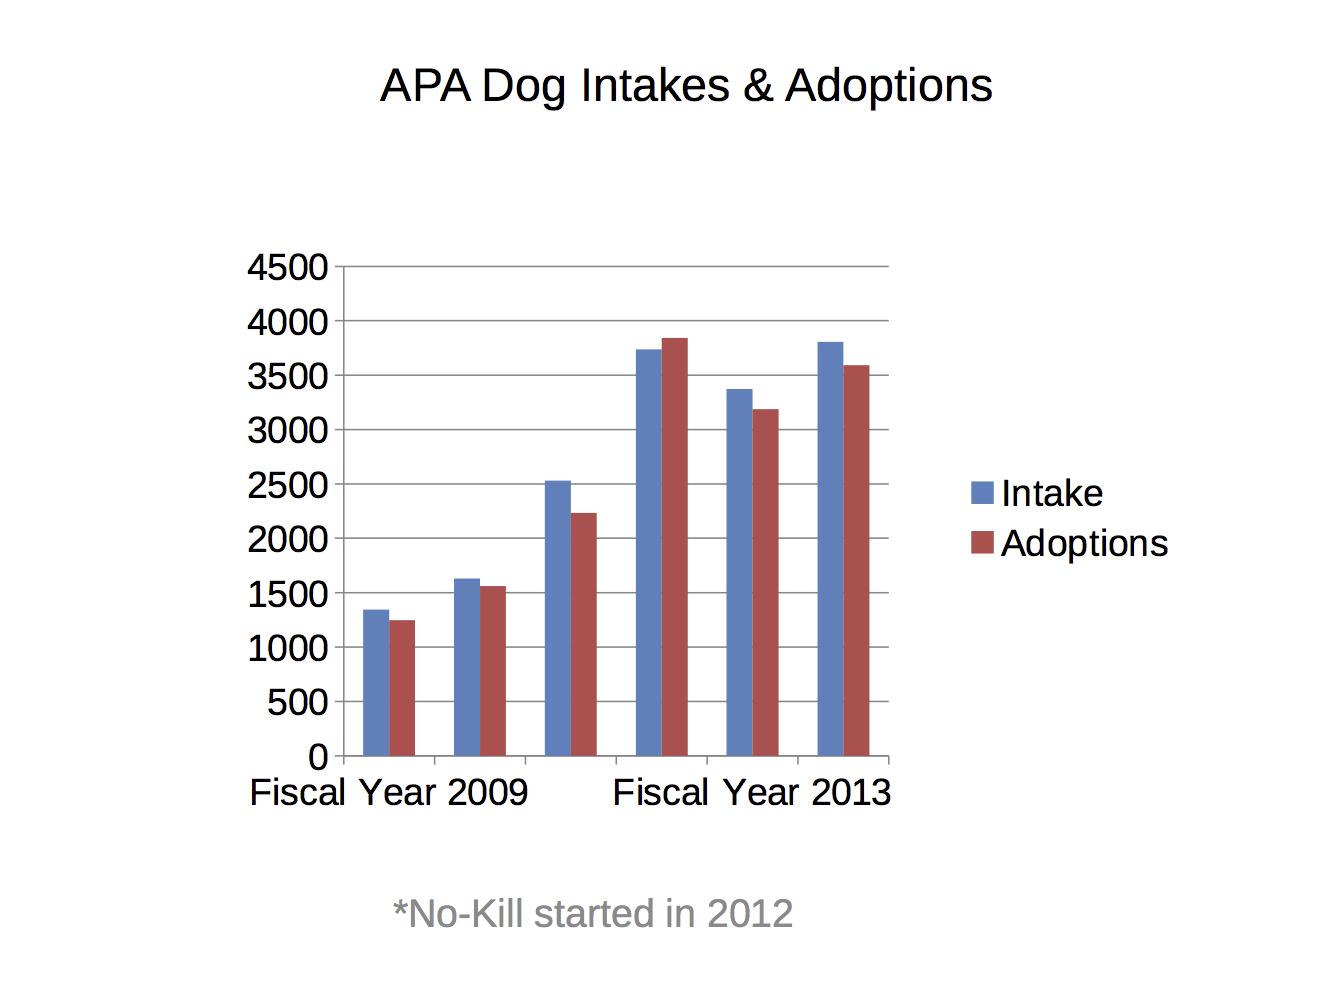 APA Dog Intakes & Adoptions graph